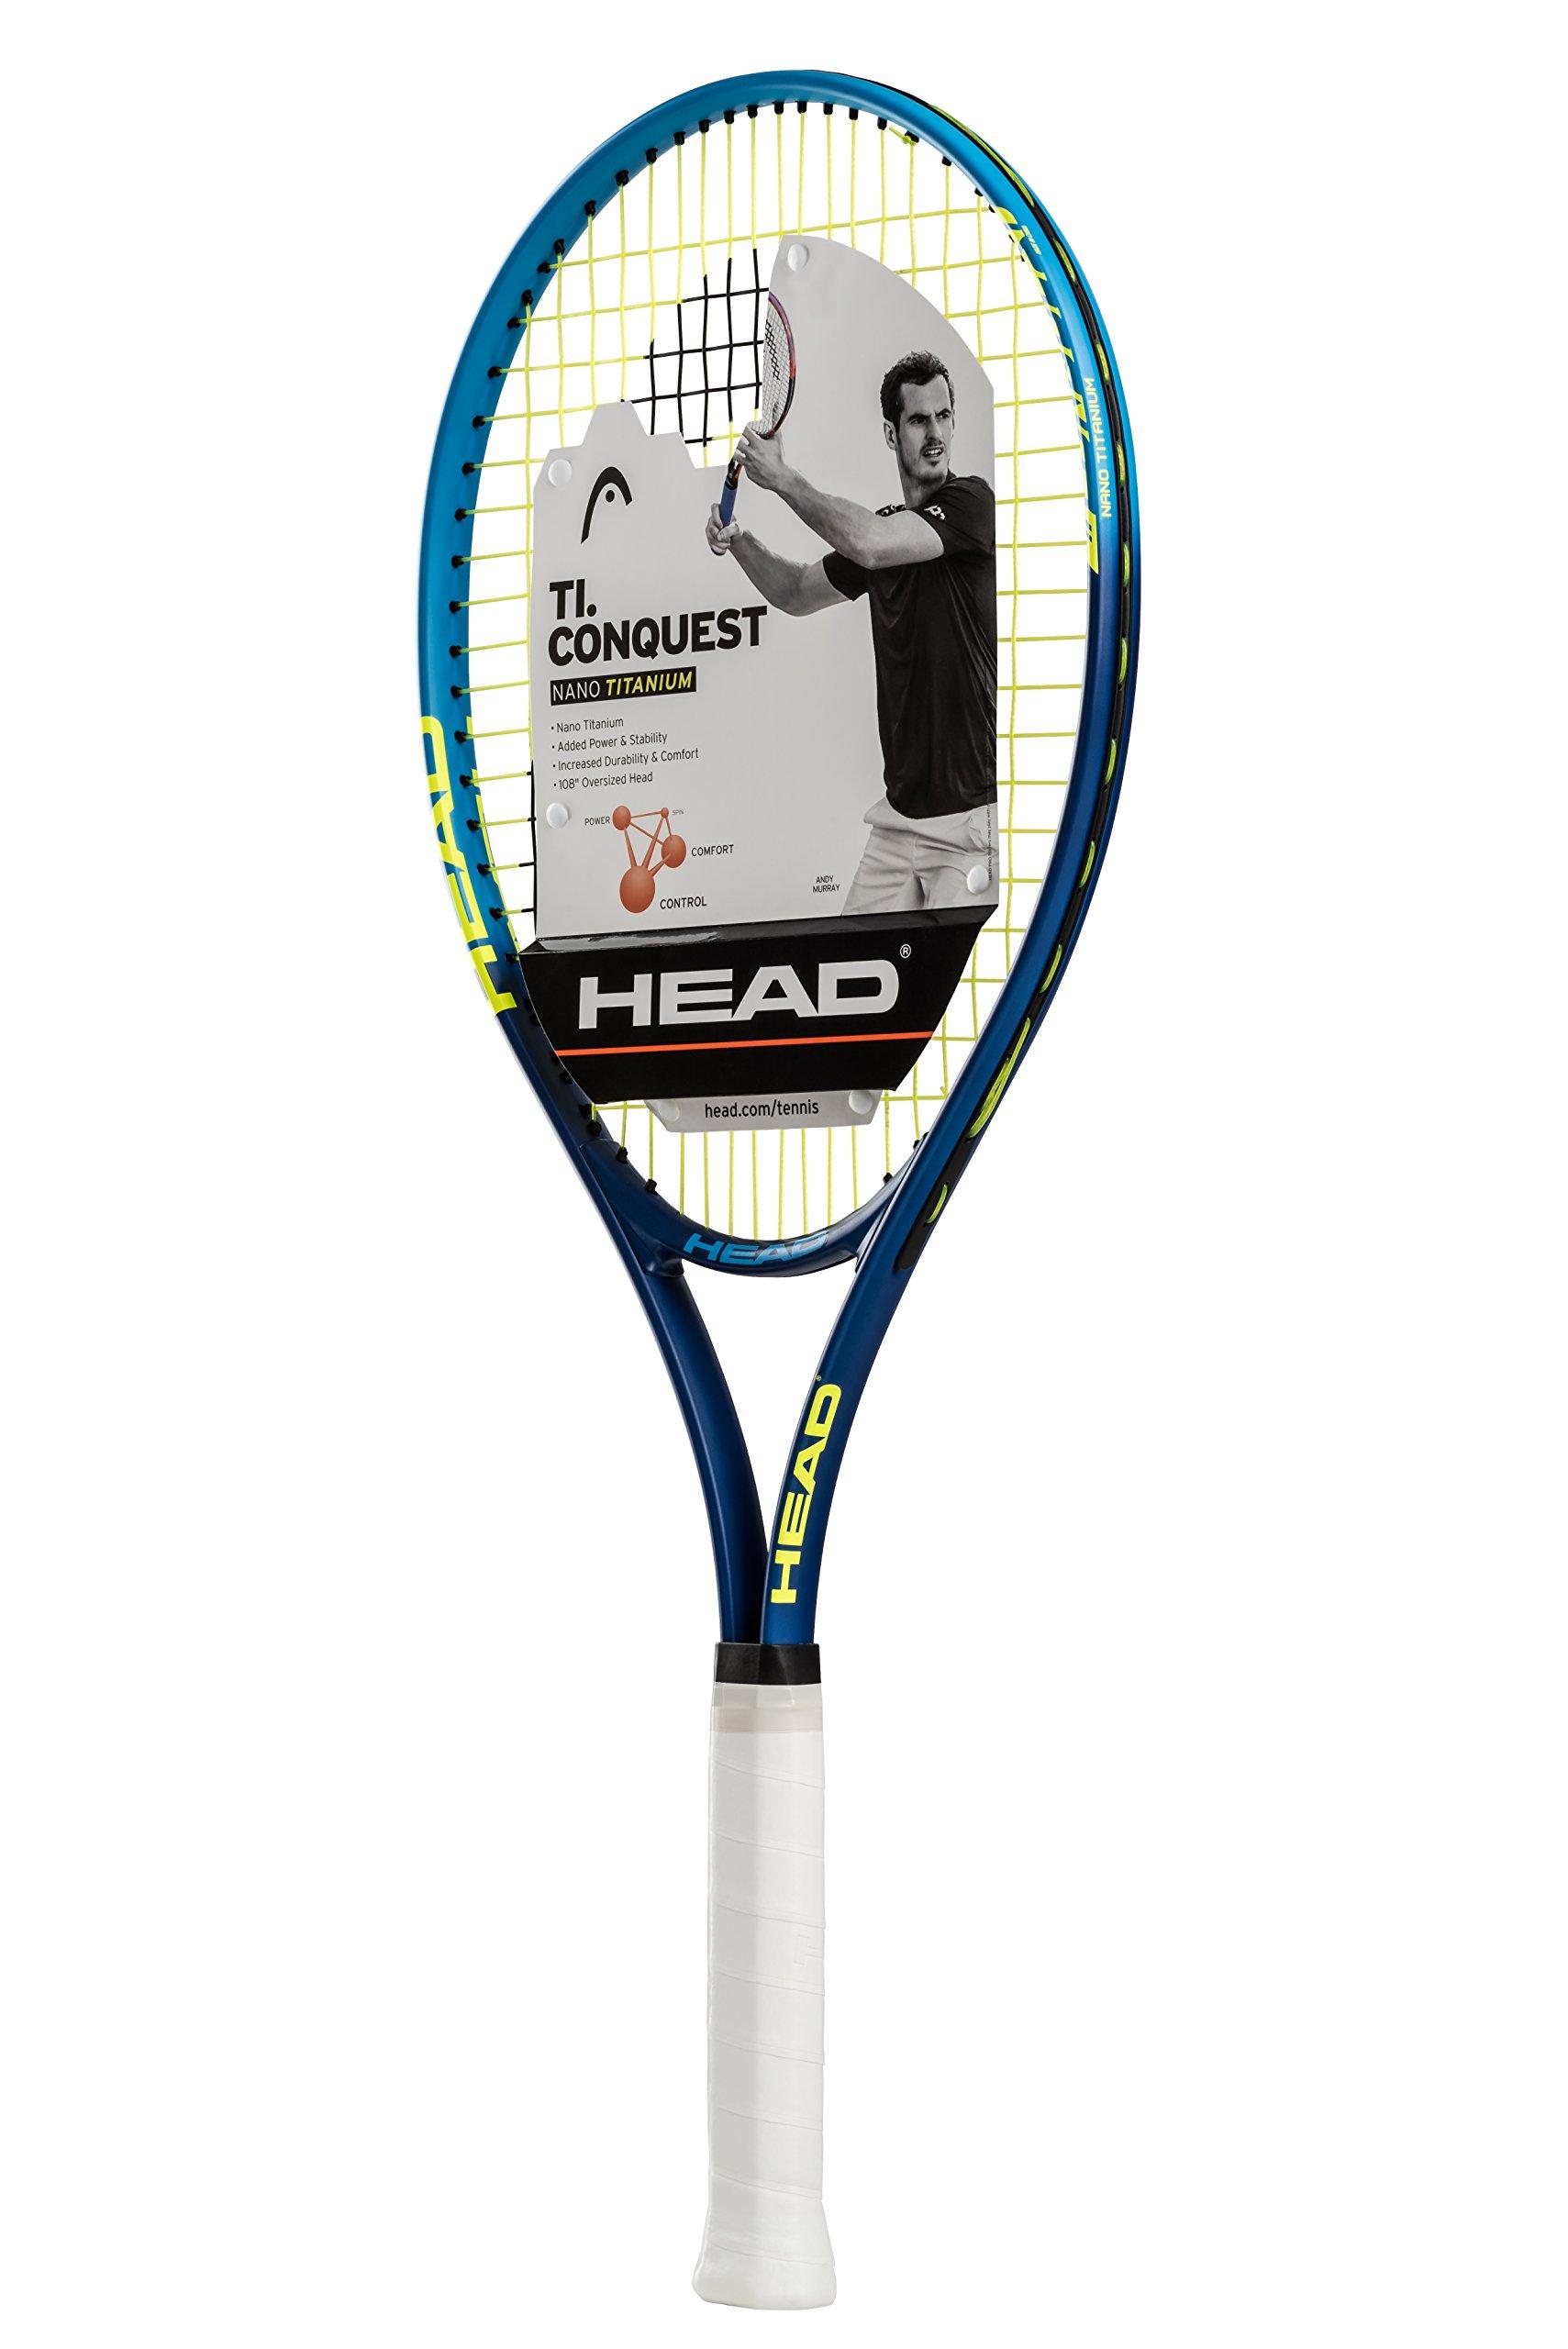 HEAD Ti.Conquest Tennis Racquet, Strung, 4 3/8 Inch Grip